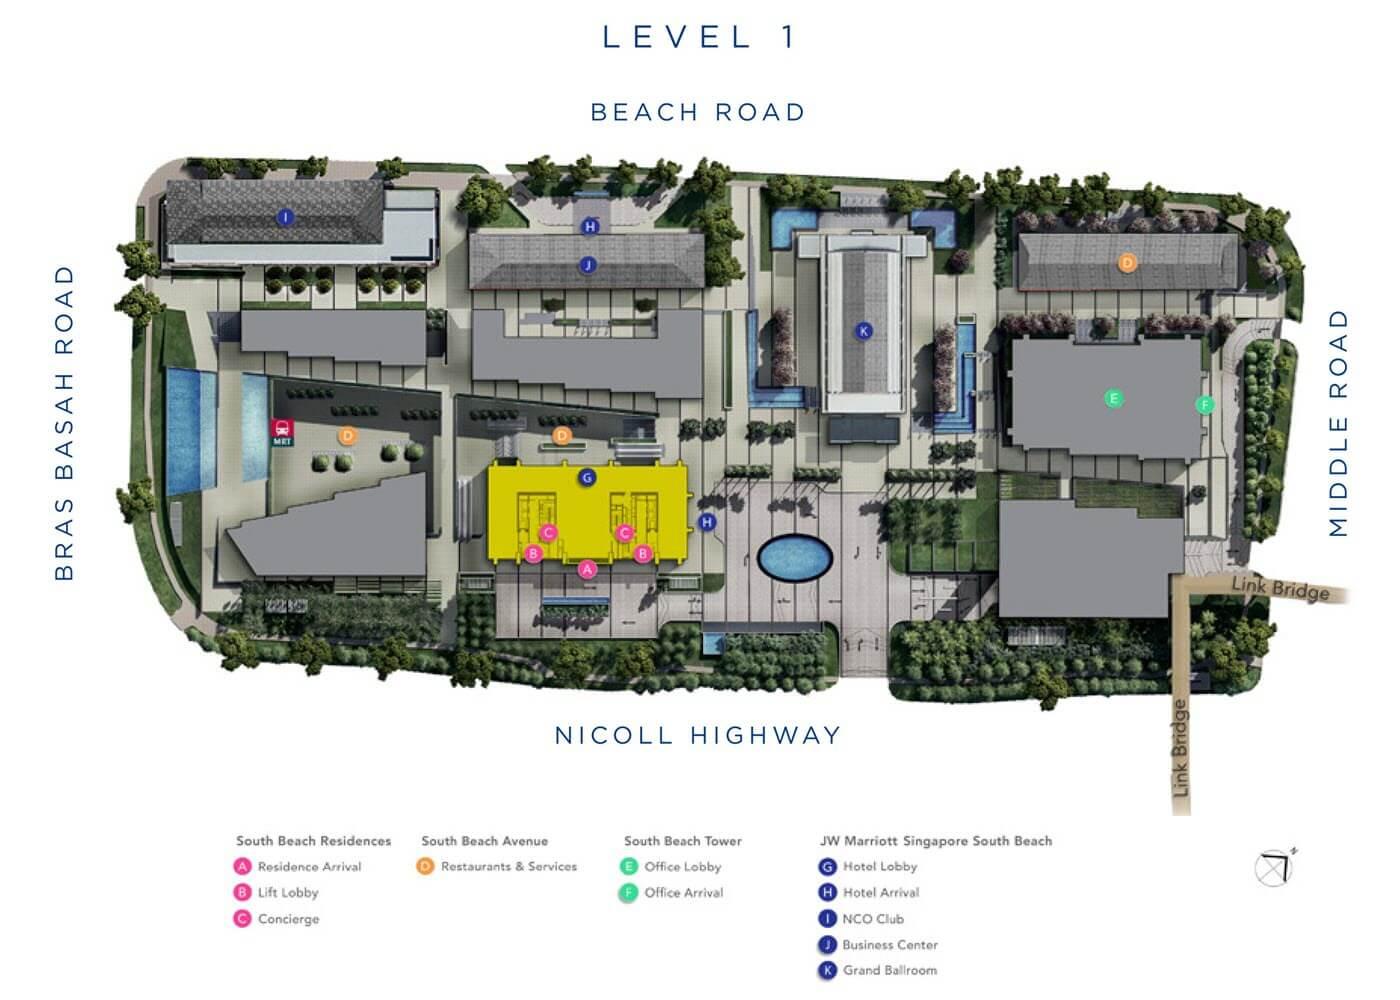 South Beach Residences Condo Site Plan Level 1